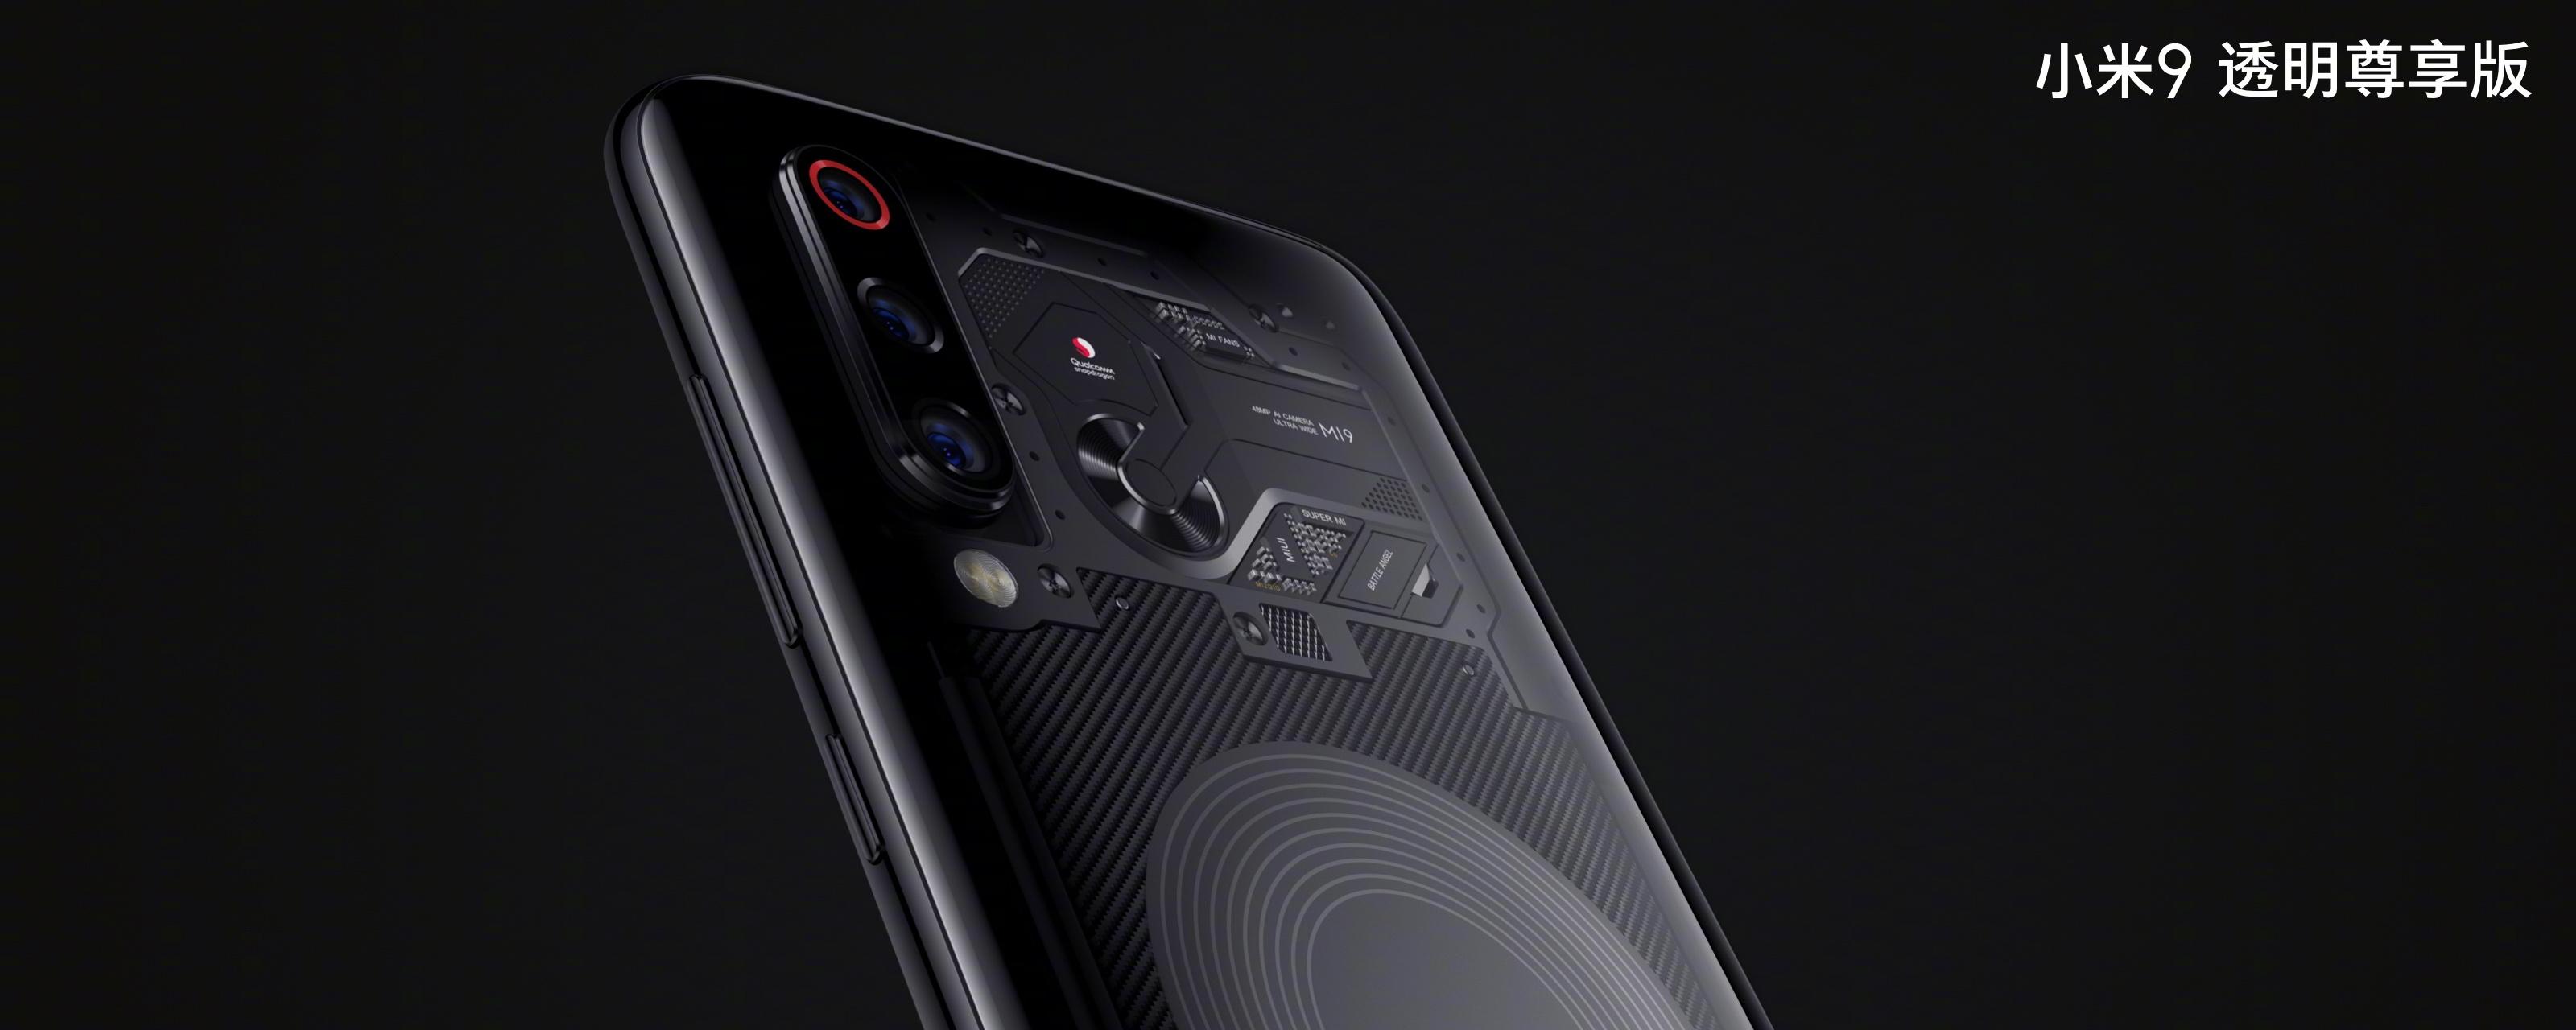 Xiaomi Mi 9 Transparent Exclusive Edition Xi